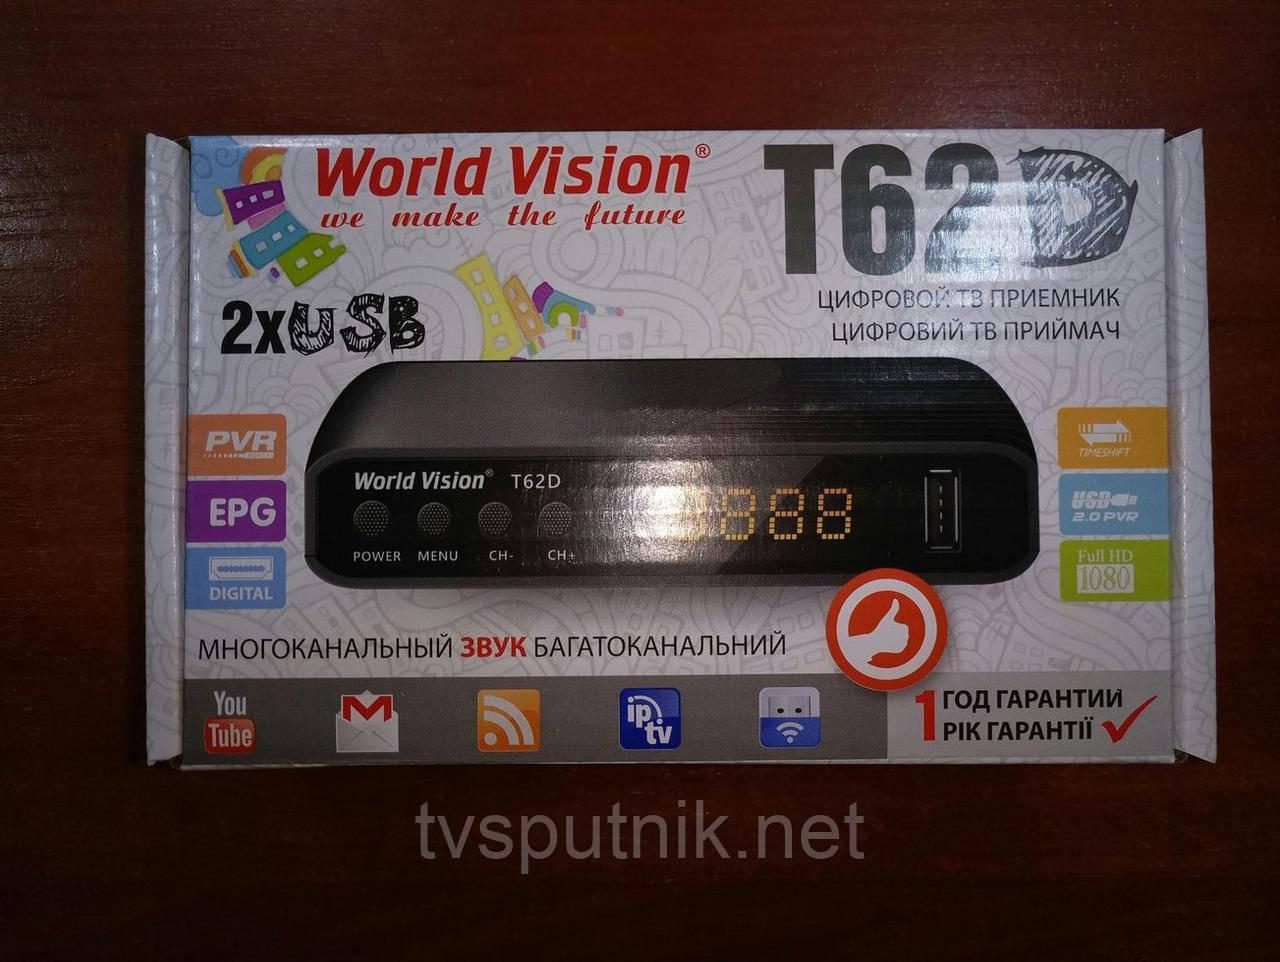 Эфирный тюнер World Vision T62D (DVB-T2, Youtube, IPTV)